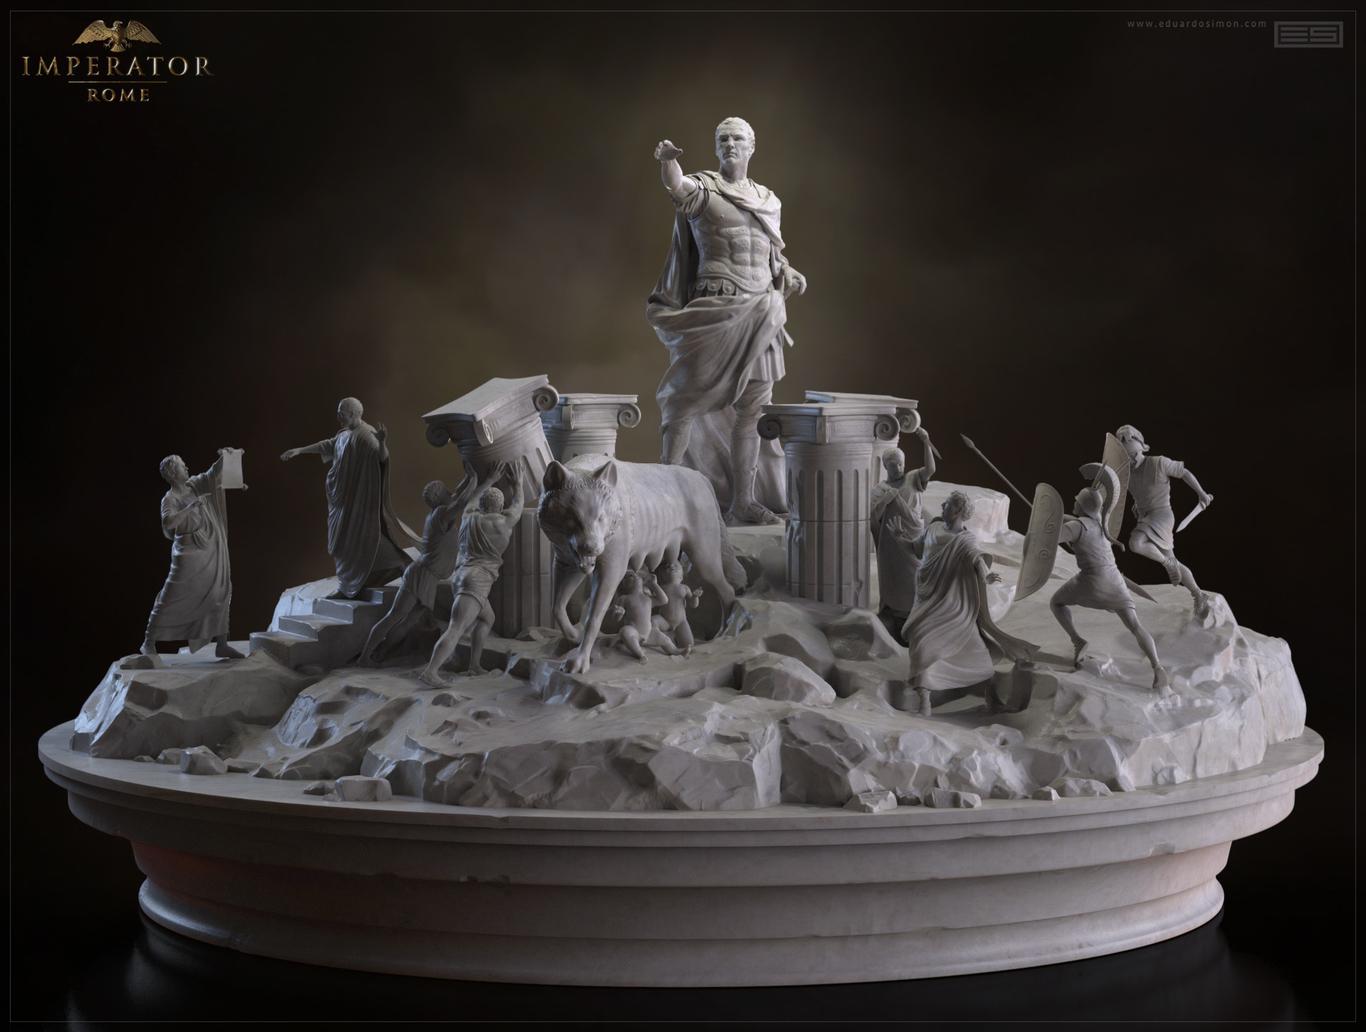 Buffalett imperator rome 1 091b359e 3wuf